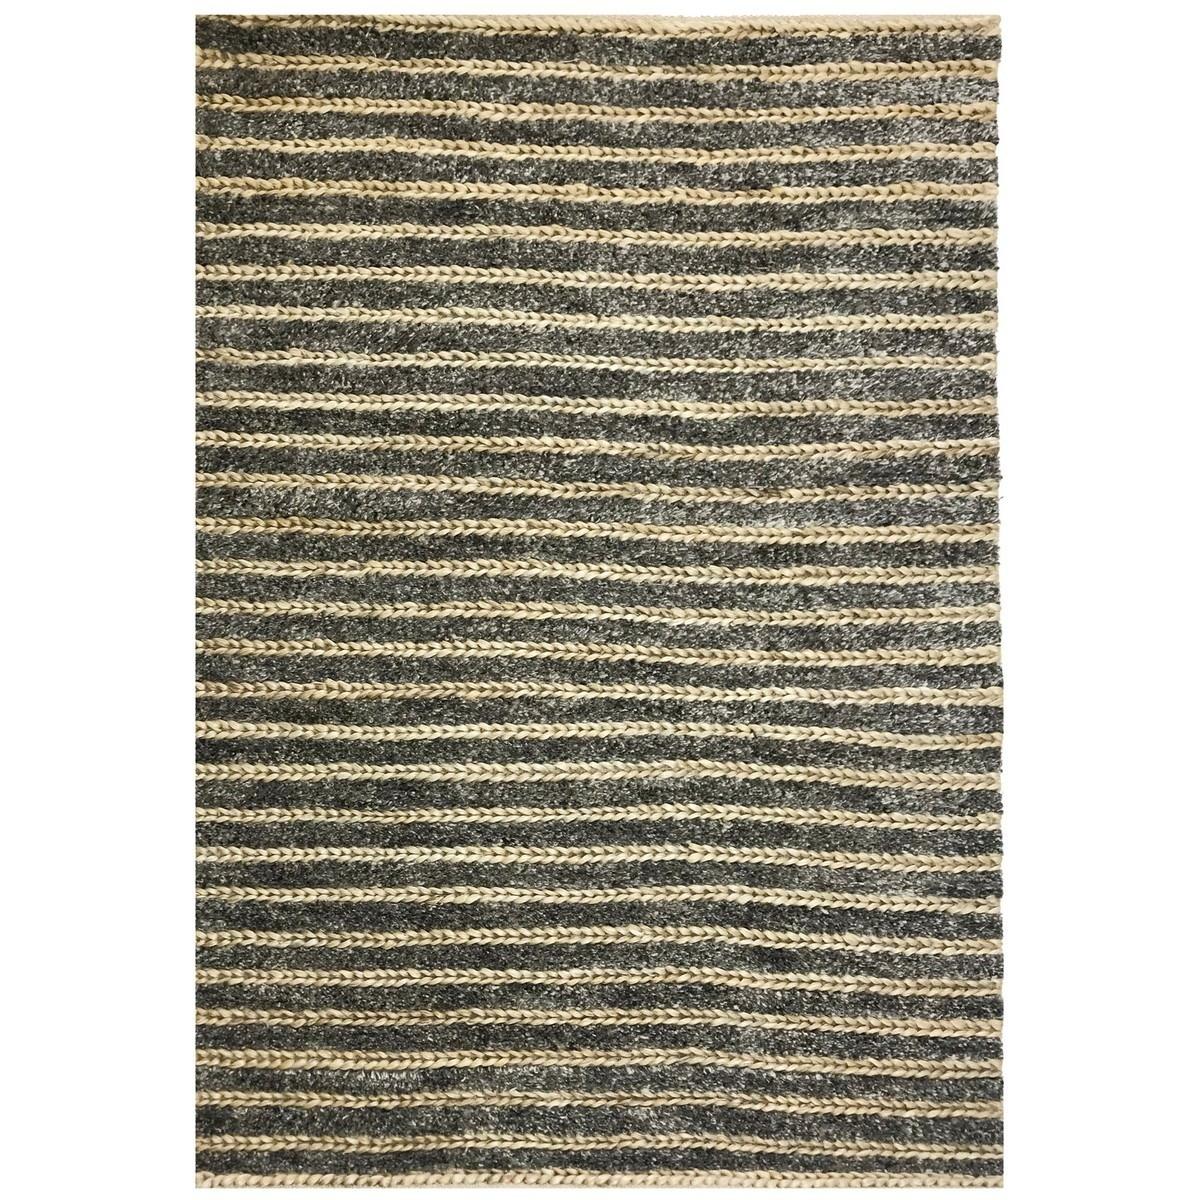 Raikal Handwoven Wool & Jute Rug, 160x110cm, Charcoal / Natural